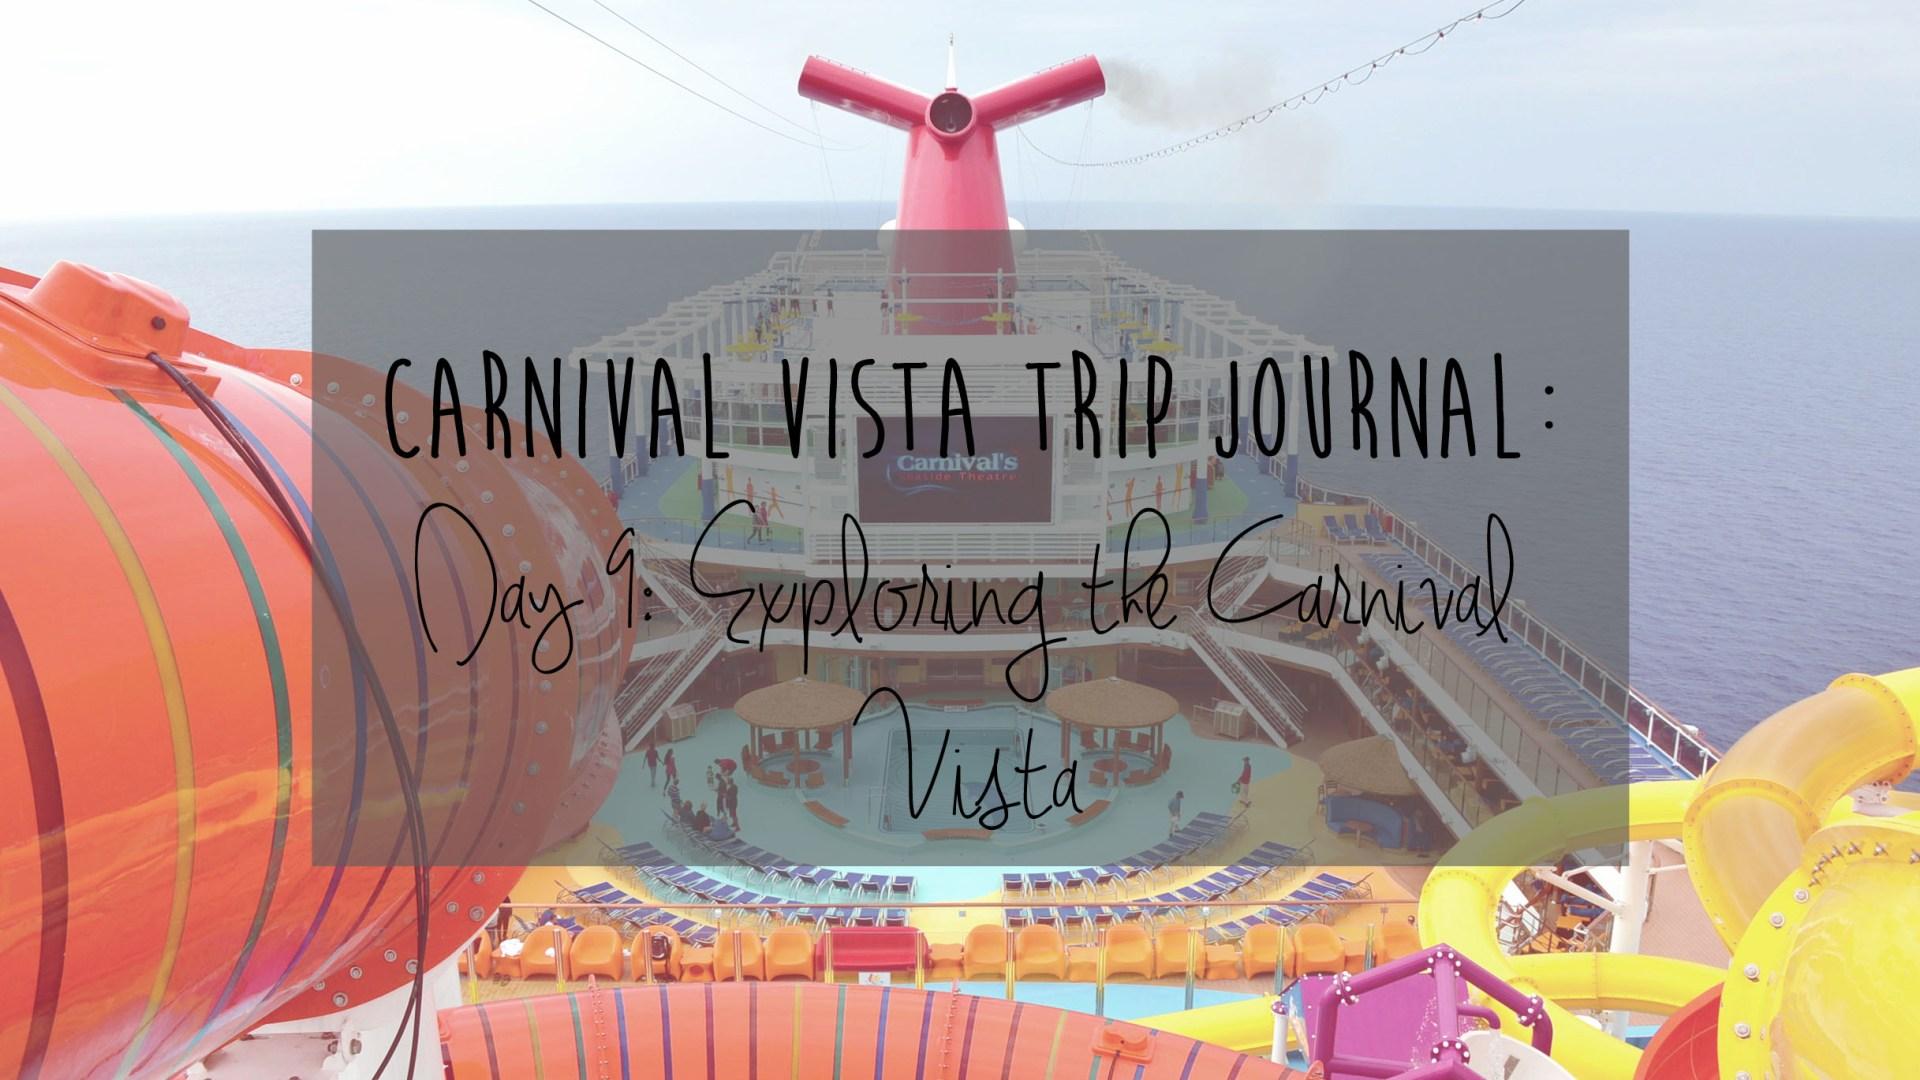 Carnival Vista Review: Day 9 – Sea Day & Exploring the Vista